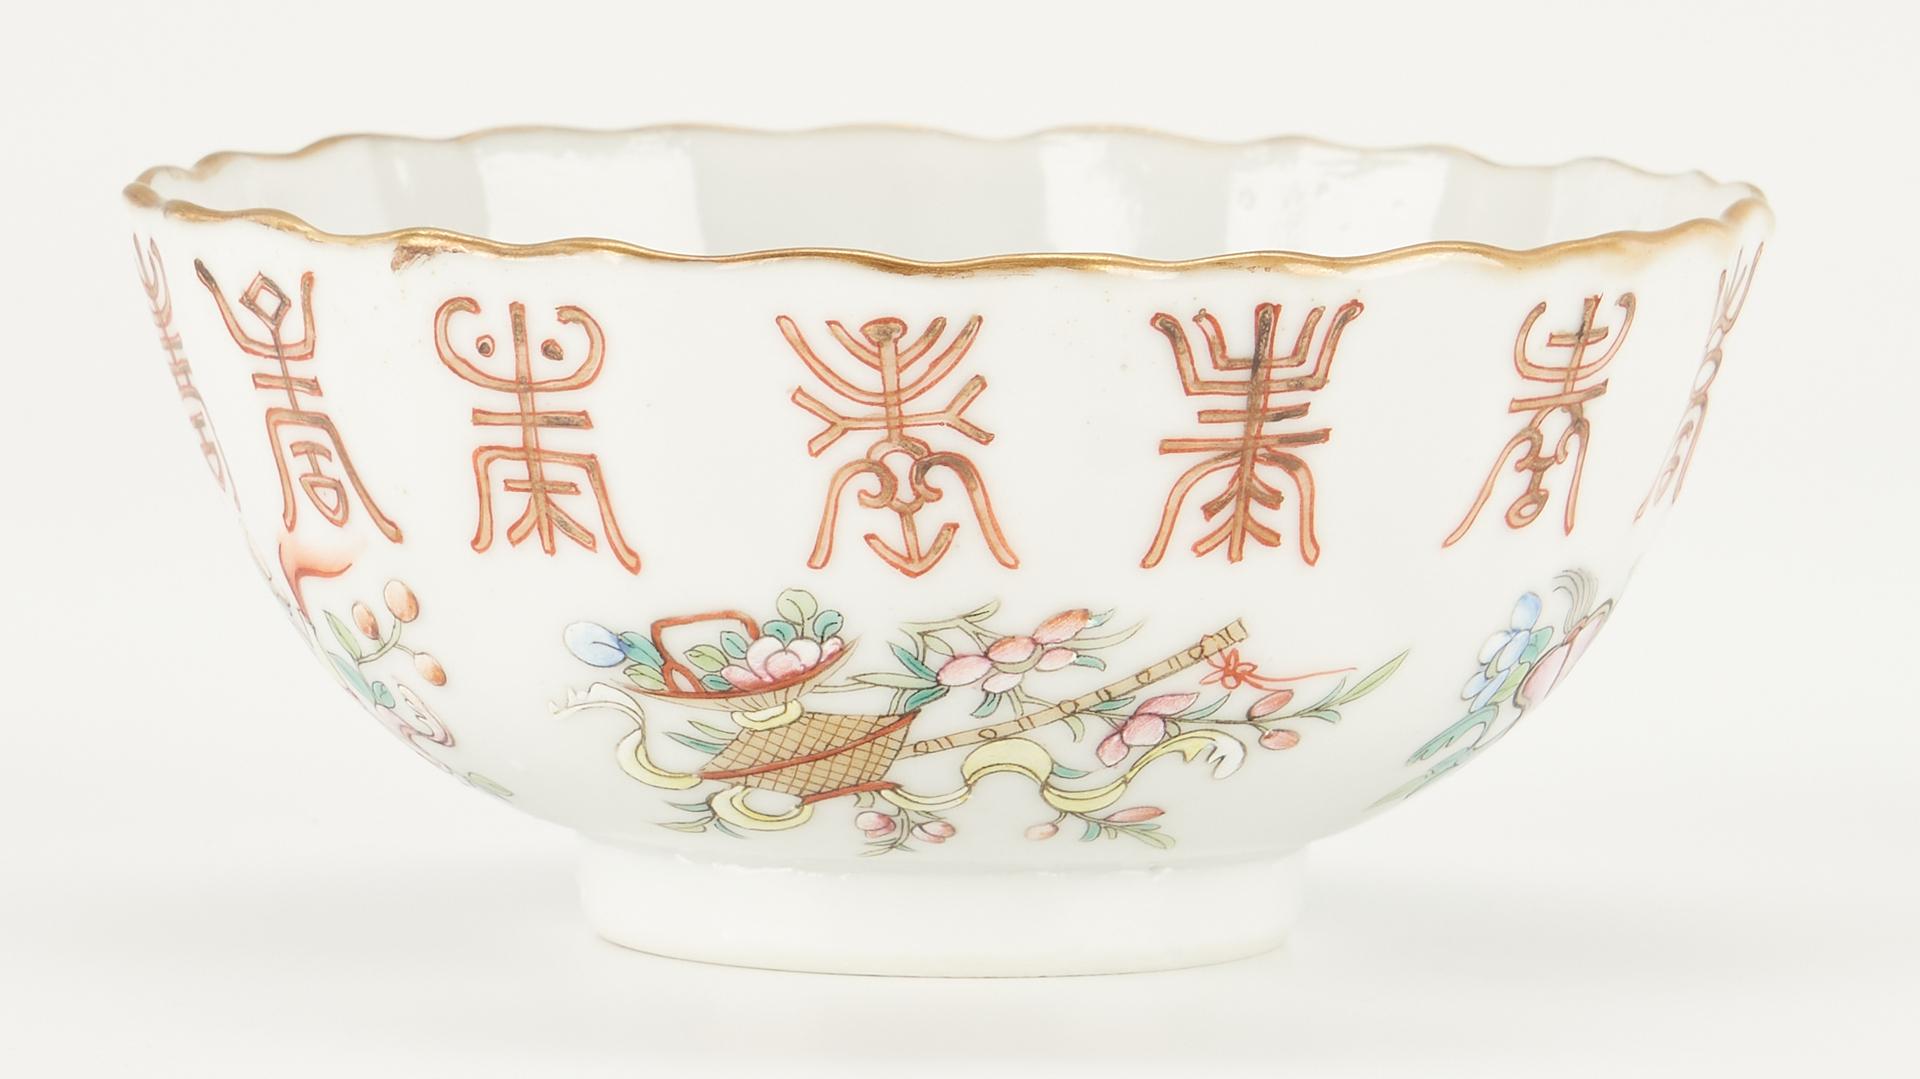 Lot 12: 3 Guangxu Famille Rose Porcelain Nesting Bowls